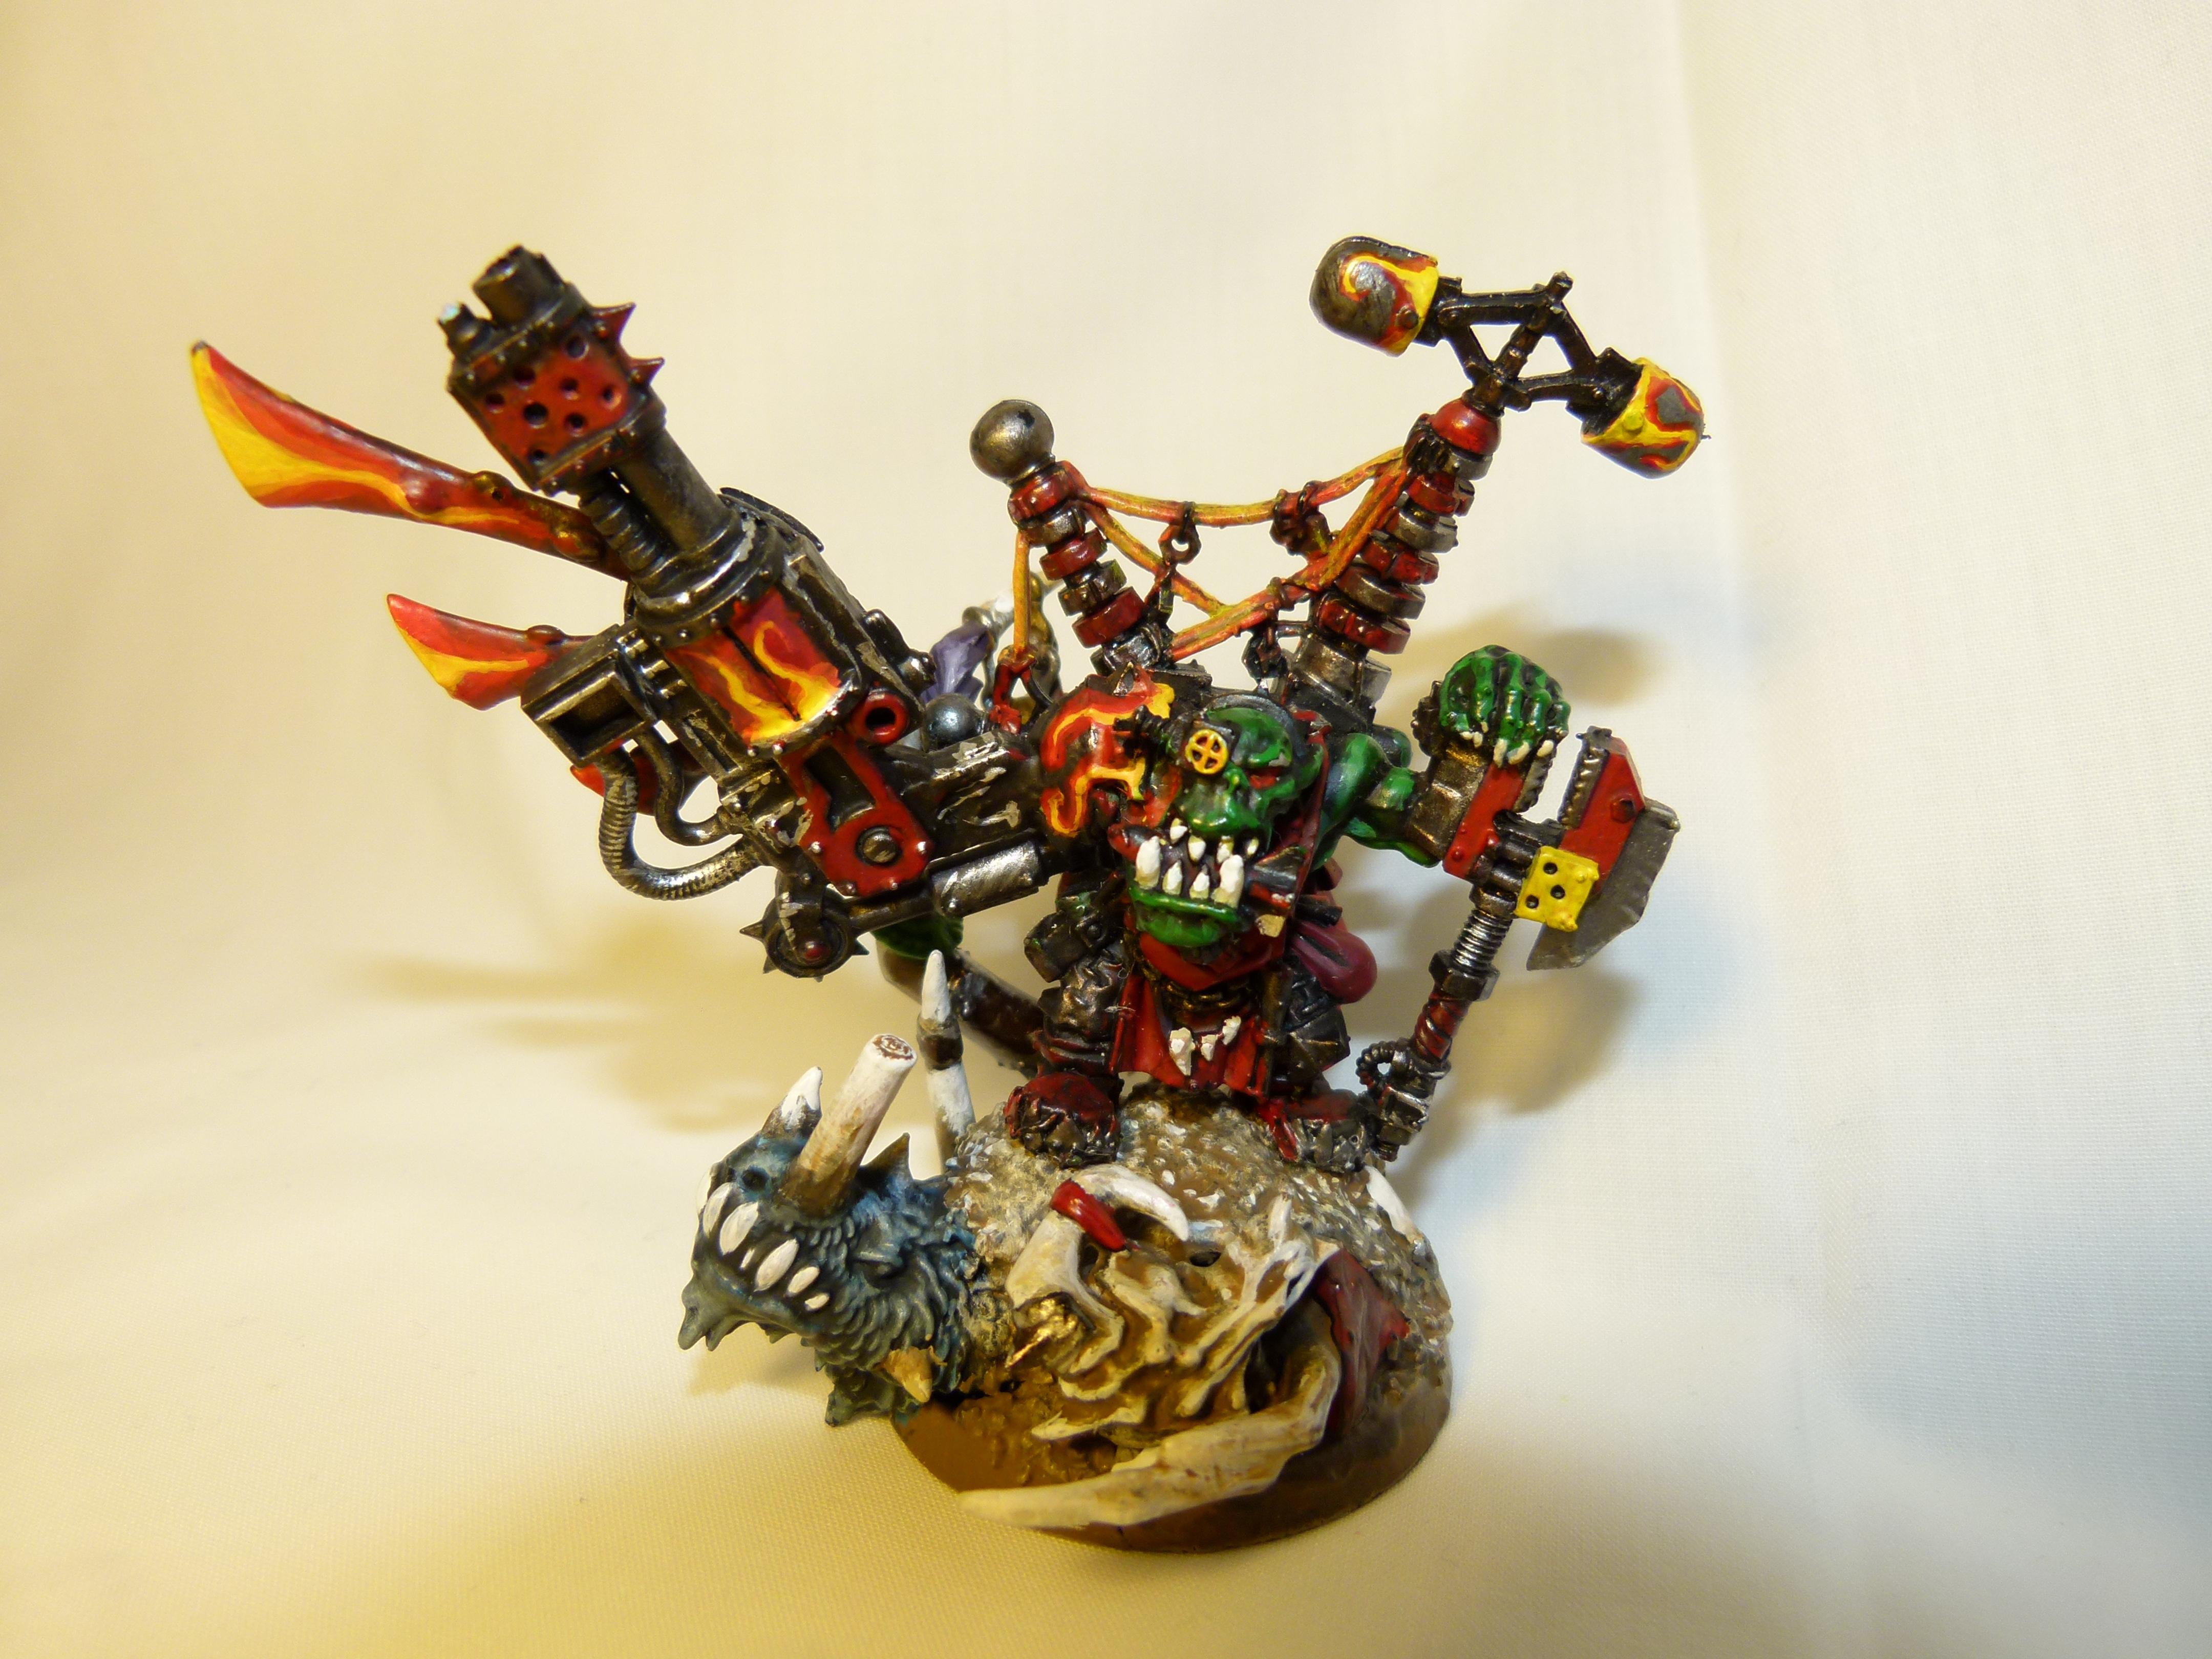 Big Mek, Burna Boyz, Conversion, Evil Sunz, Kustom Force Field, Mekboy, Ork Mek, Orks, Warhammer 40,000